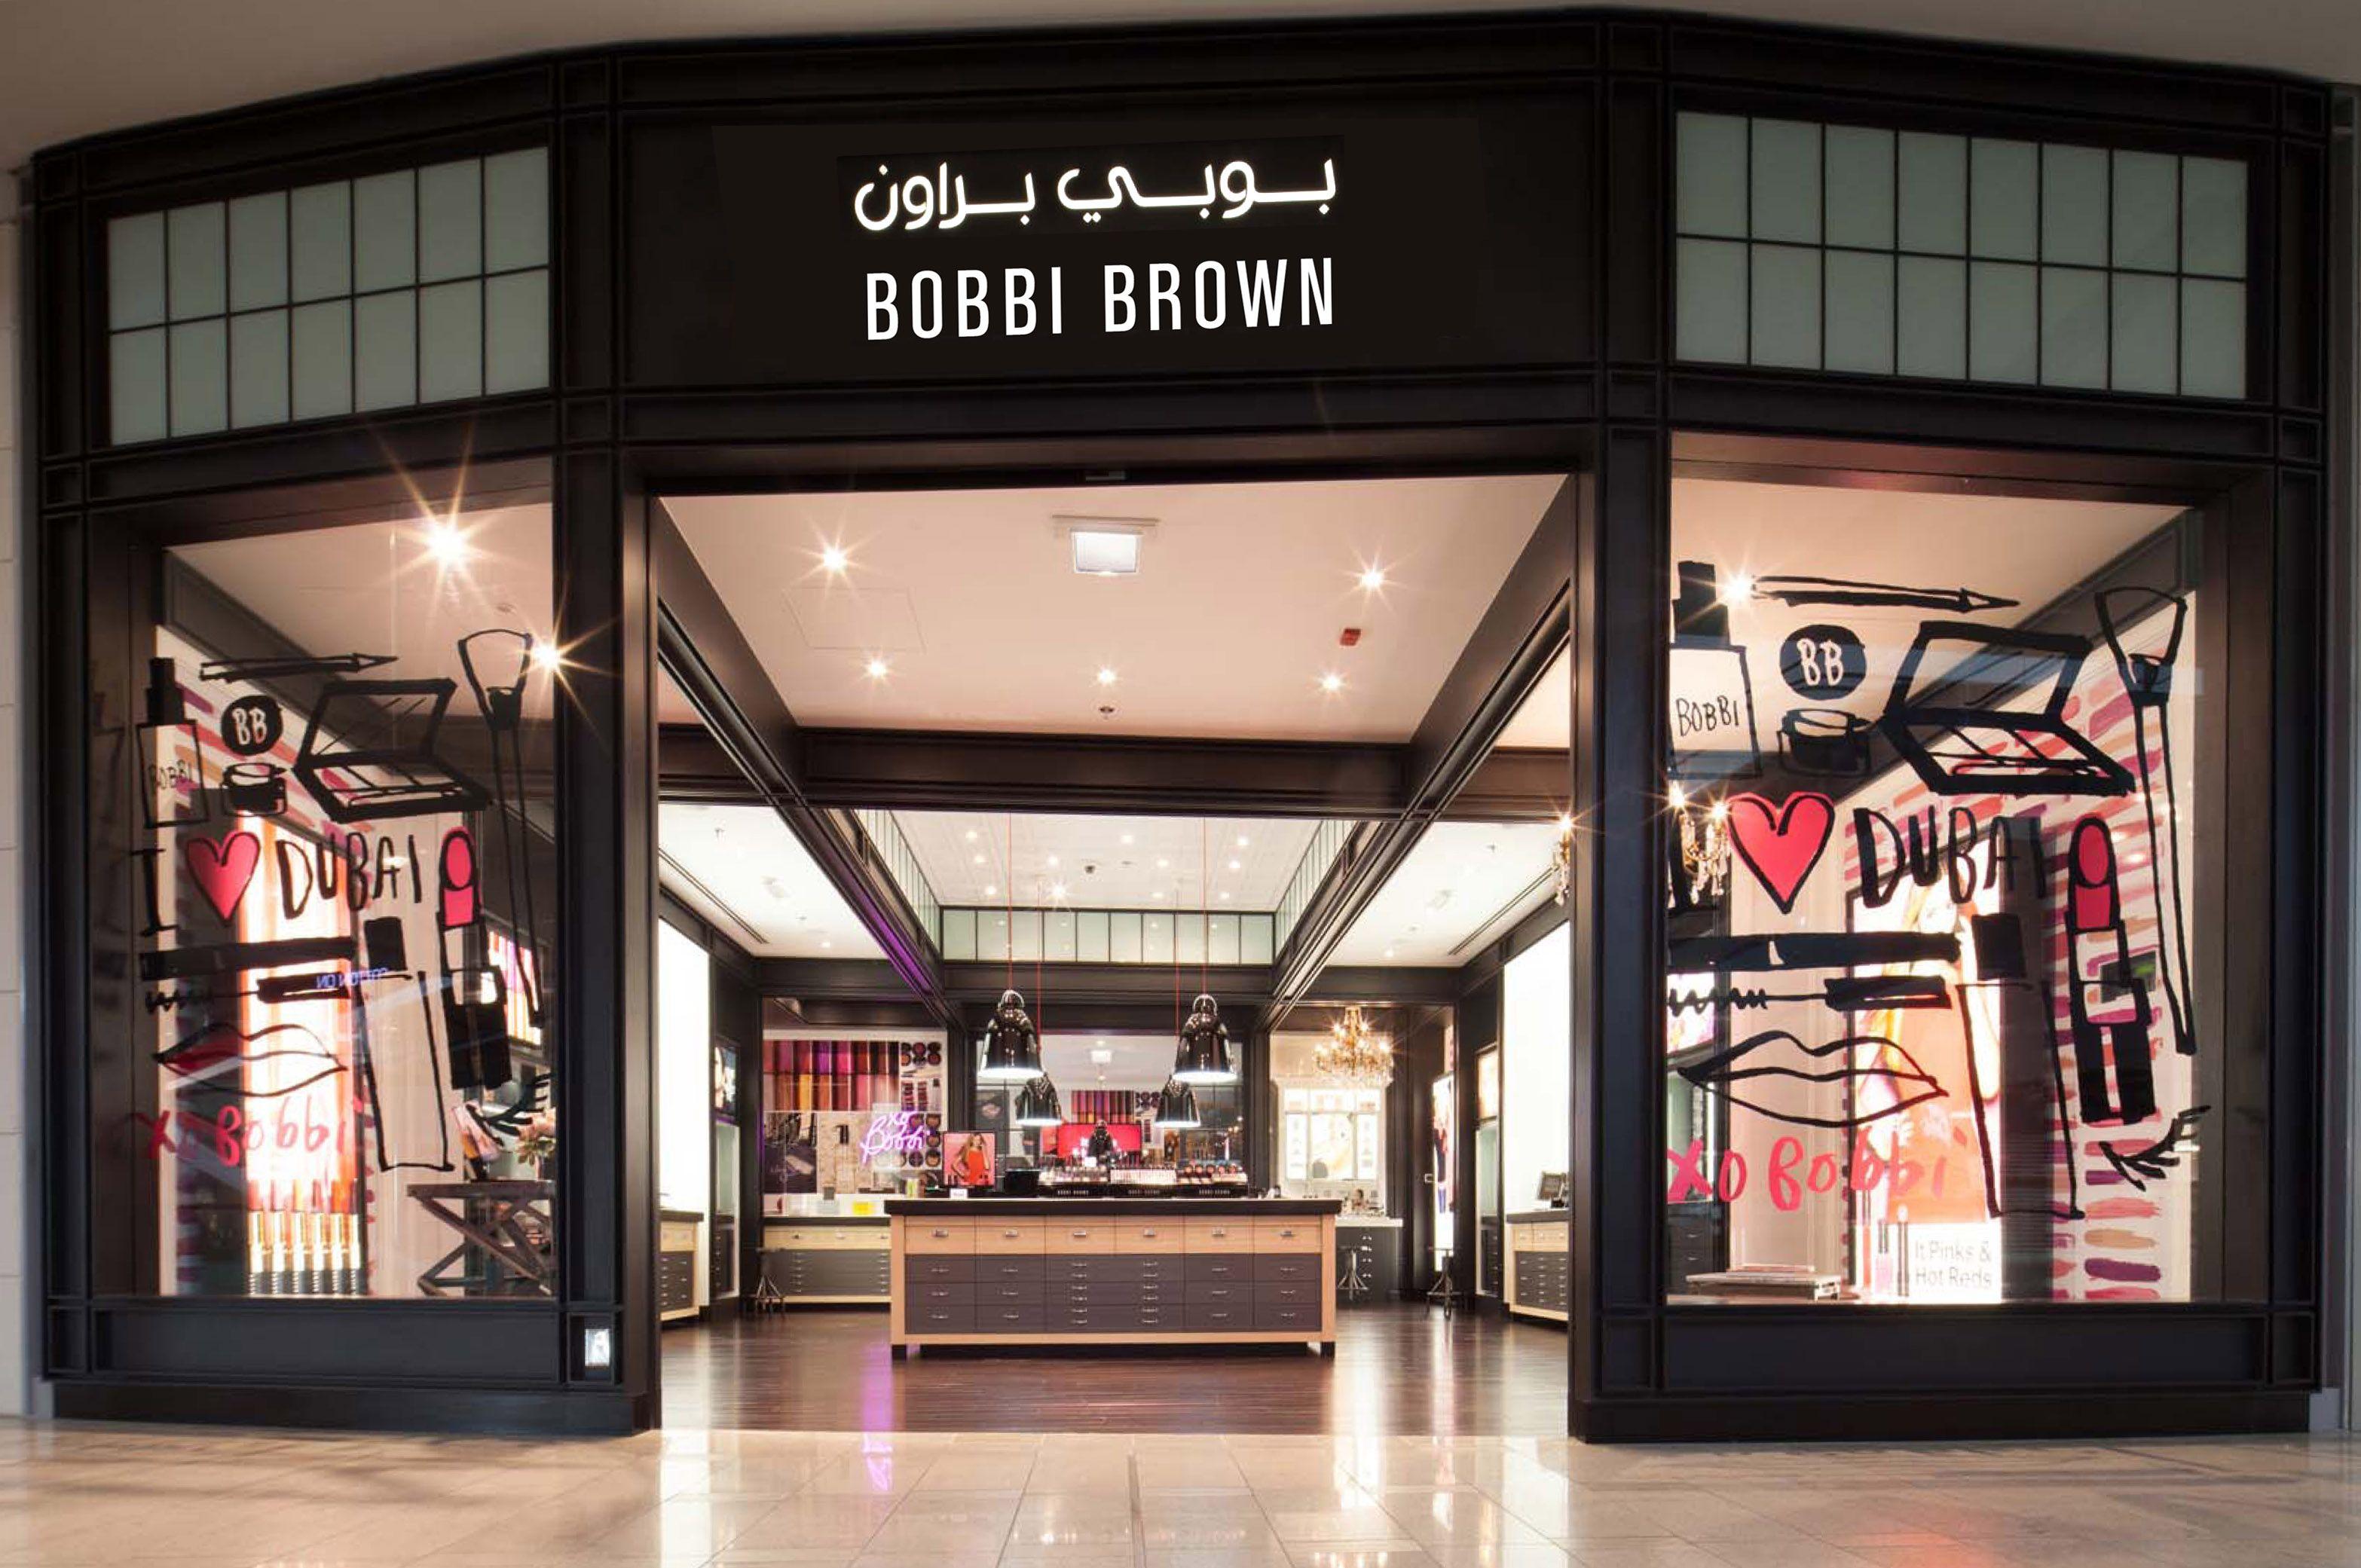 Bobbi Brown Pavilion Retail Display Pinterest And